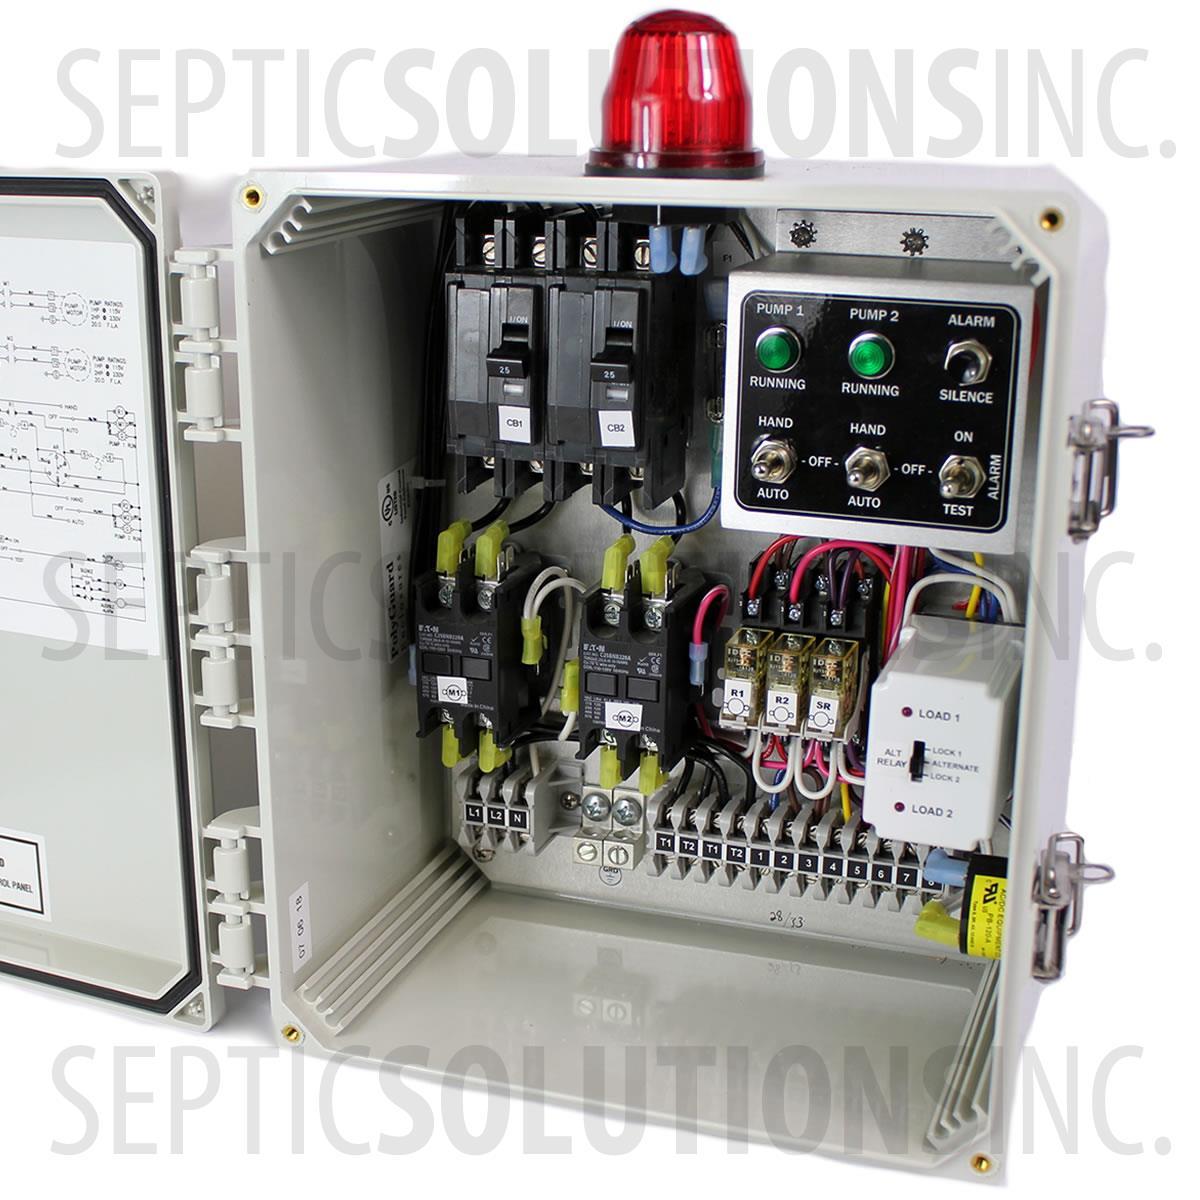 medium resolution of duplex pump control panel schematic low level switch motor sje rhombus wiring diagram panels sje control rhombus 1121w120h16b17c